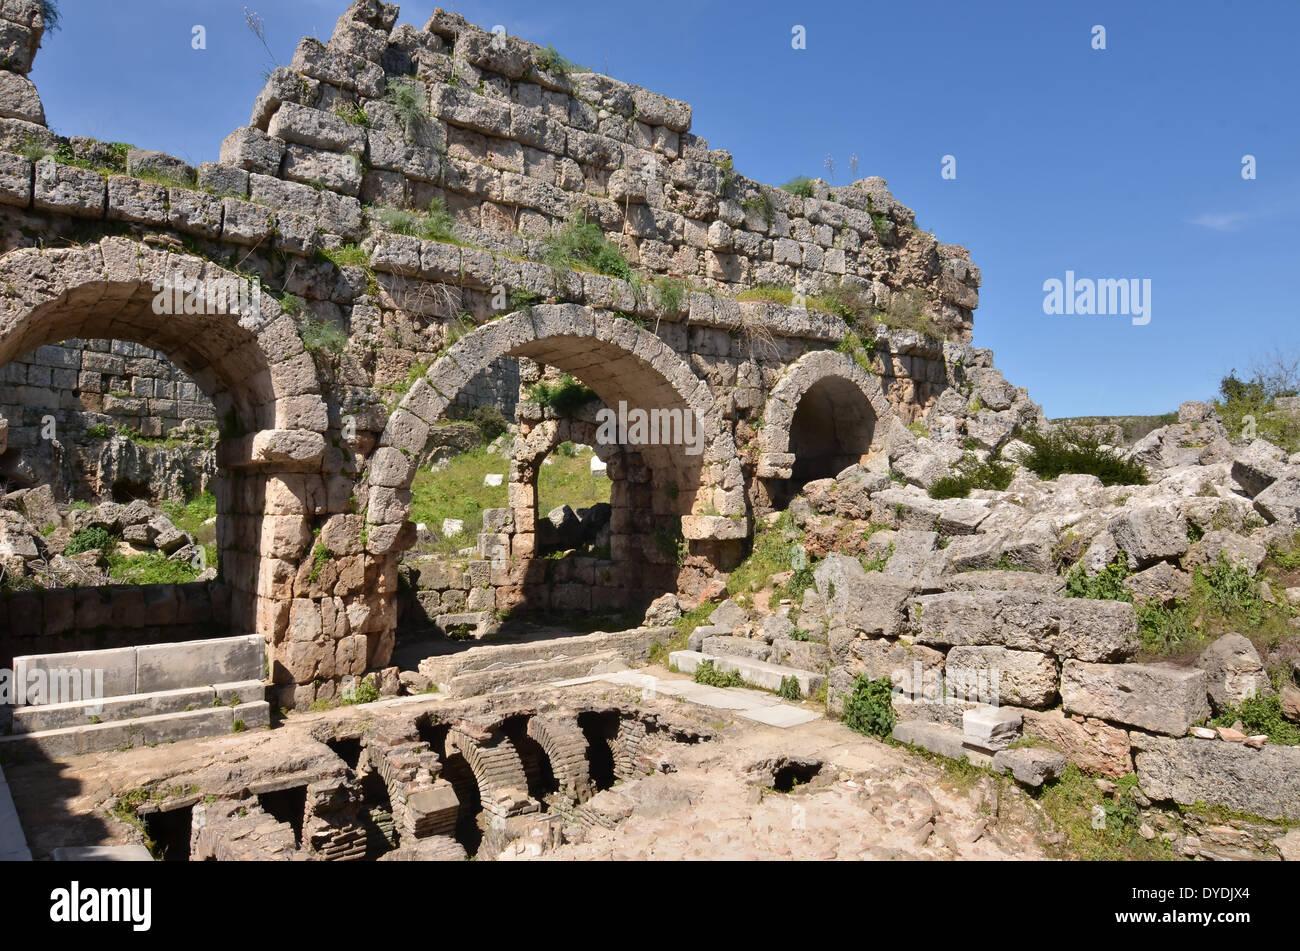 Greek Architecture greece europe greek architecture ancient greece europe stone